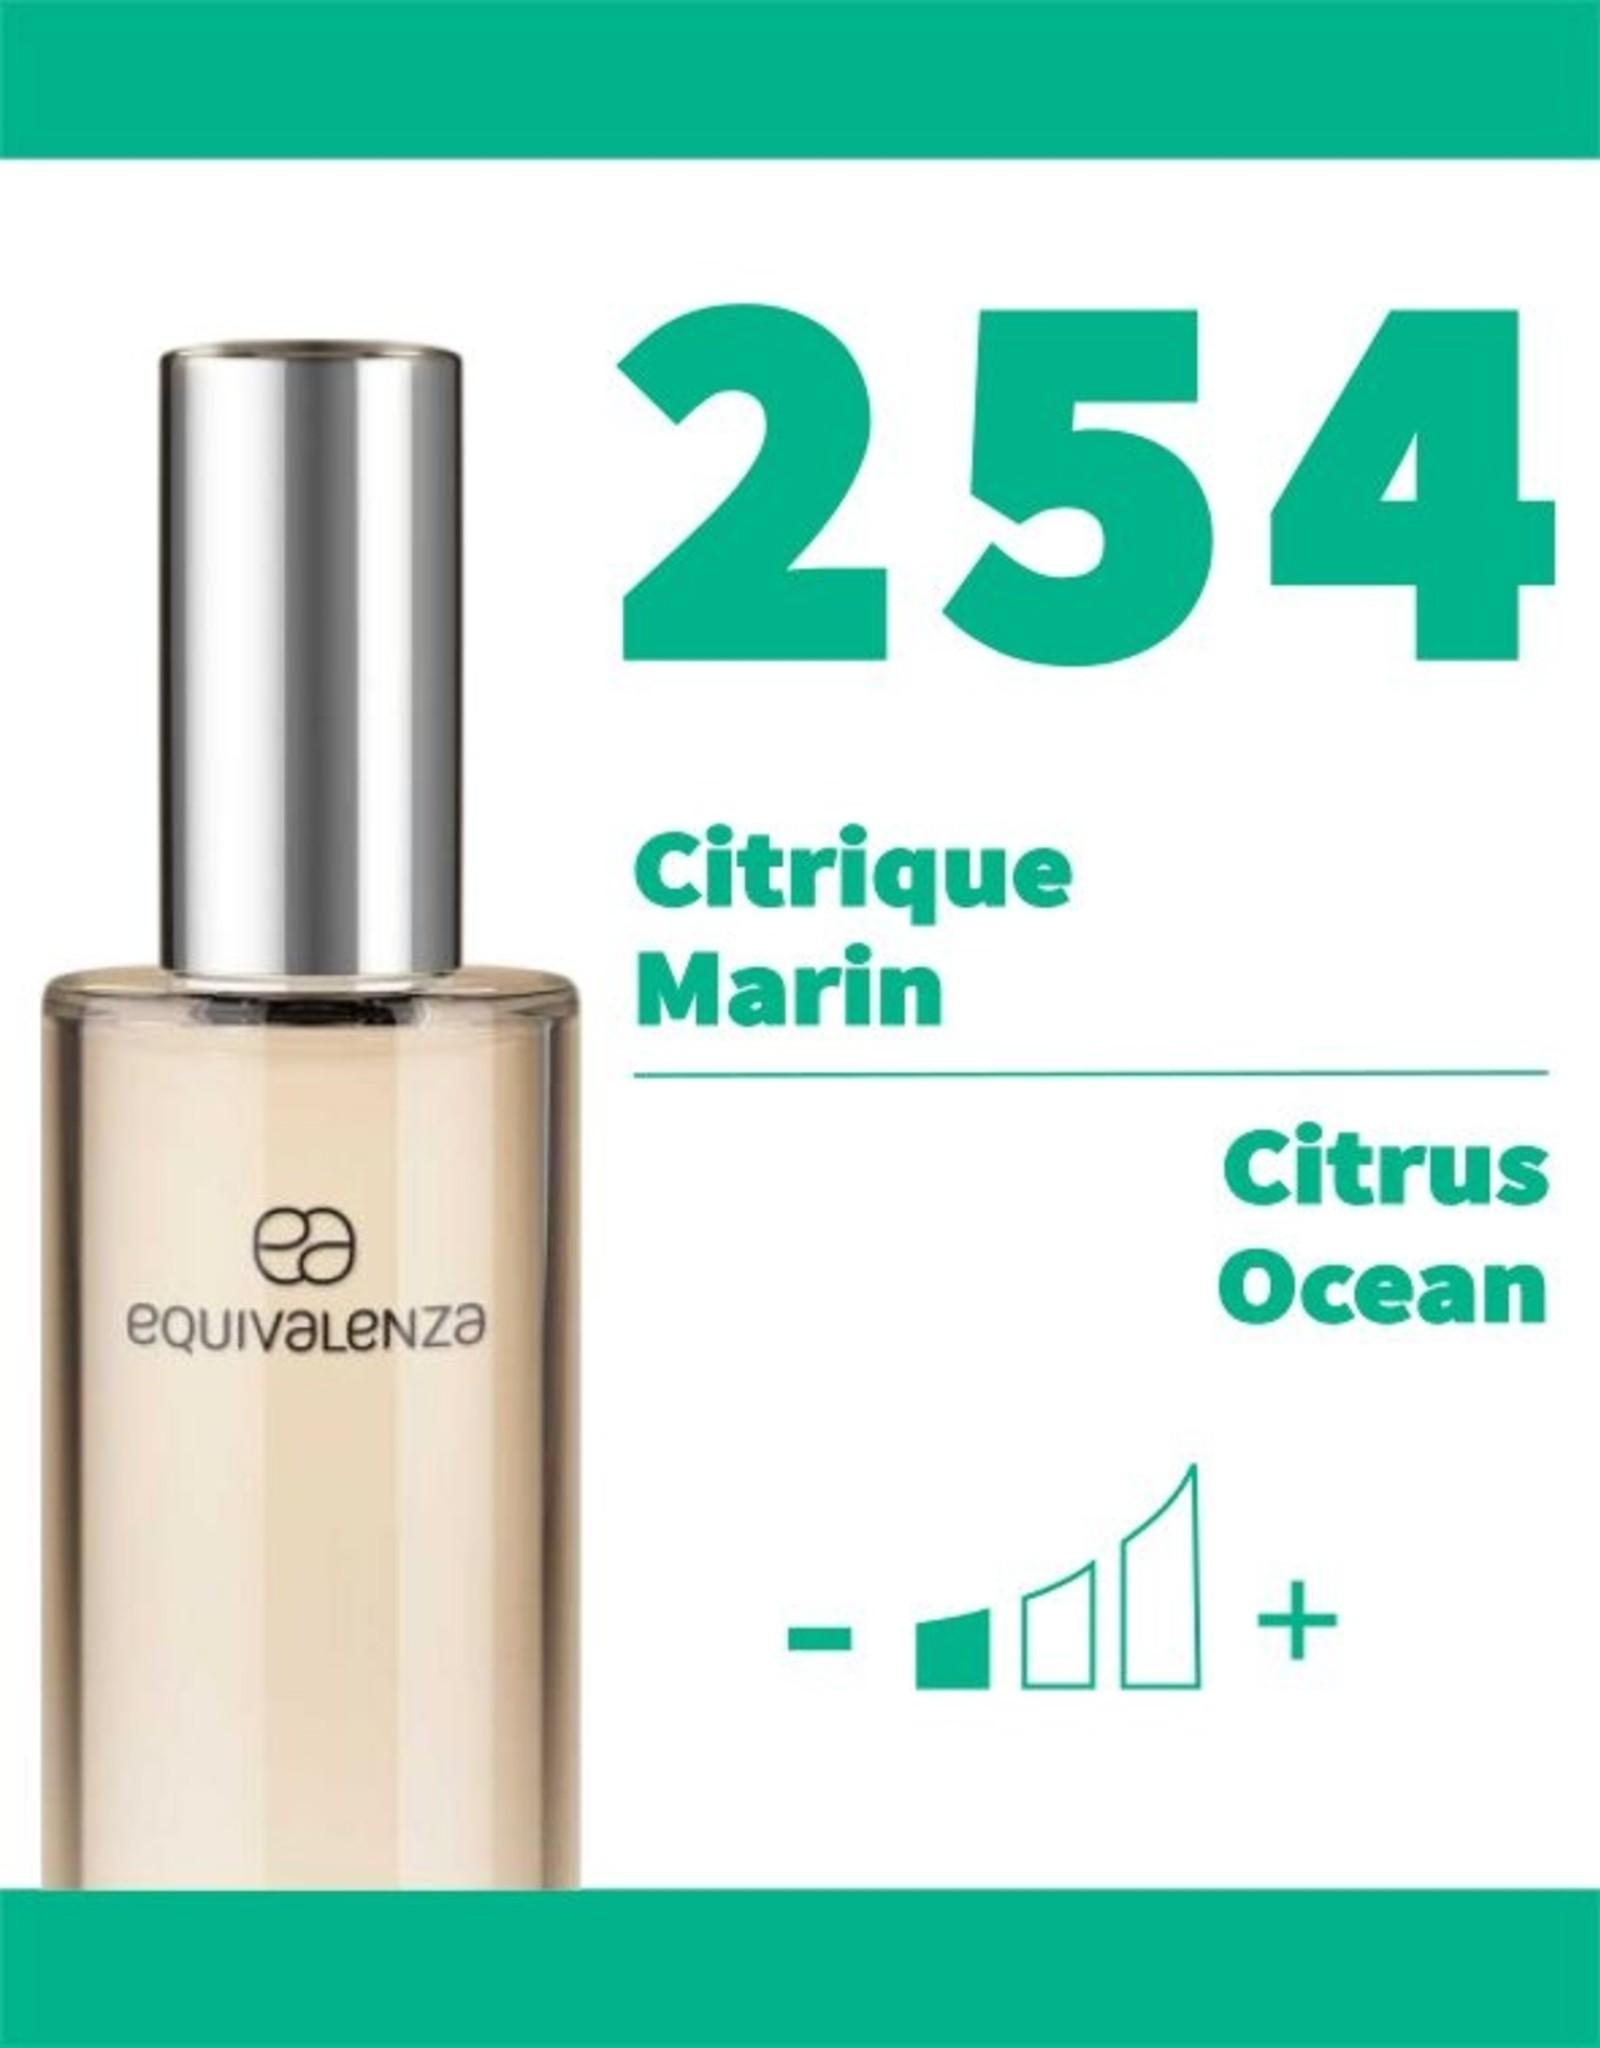 Equivalenza Citrus Ocean 254